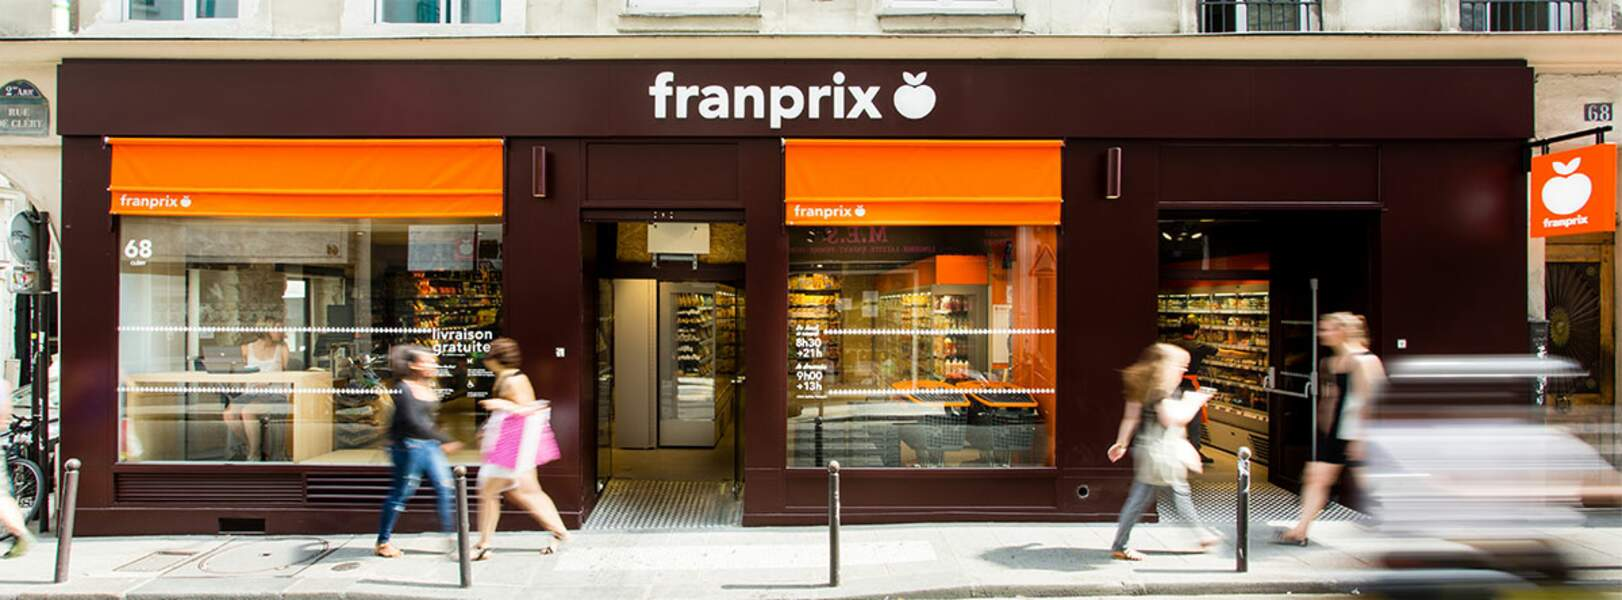 5.Franprix